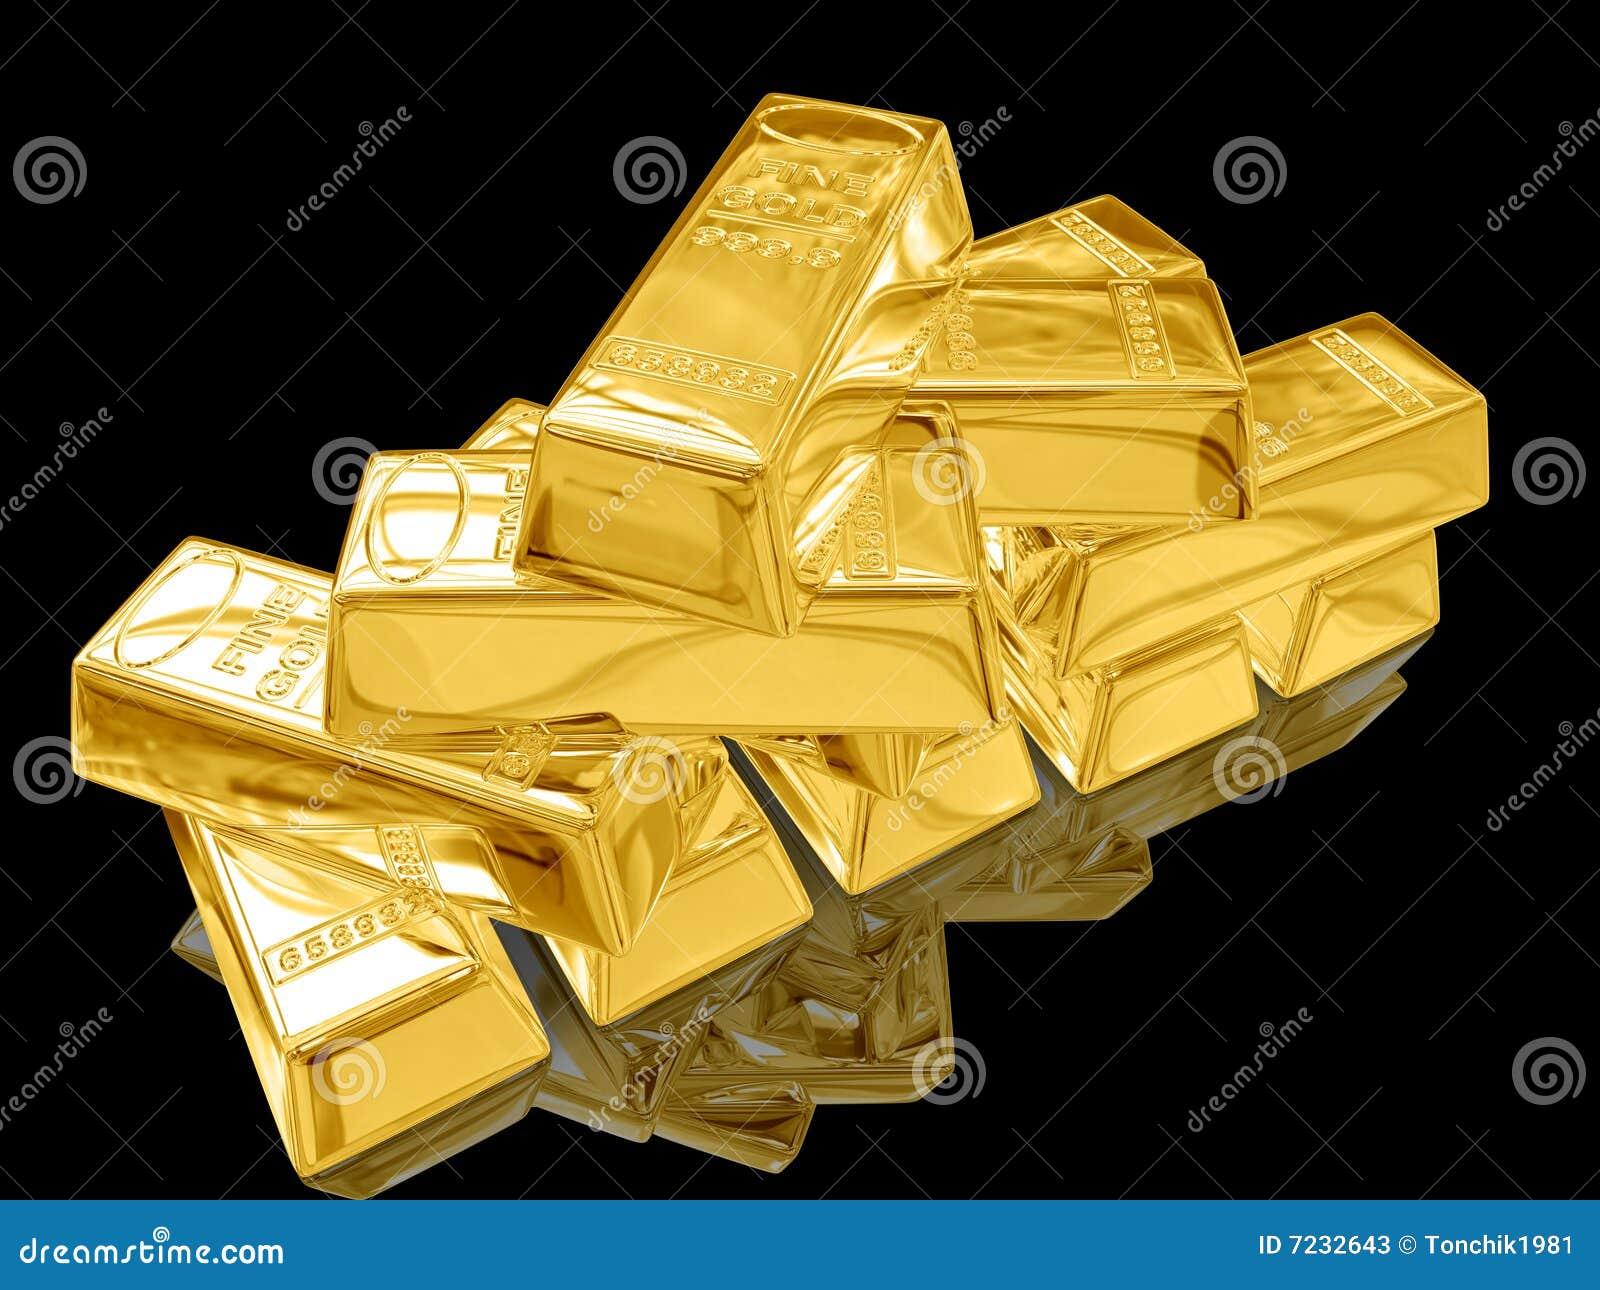 gold bar black background - photo #7